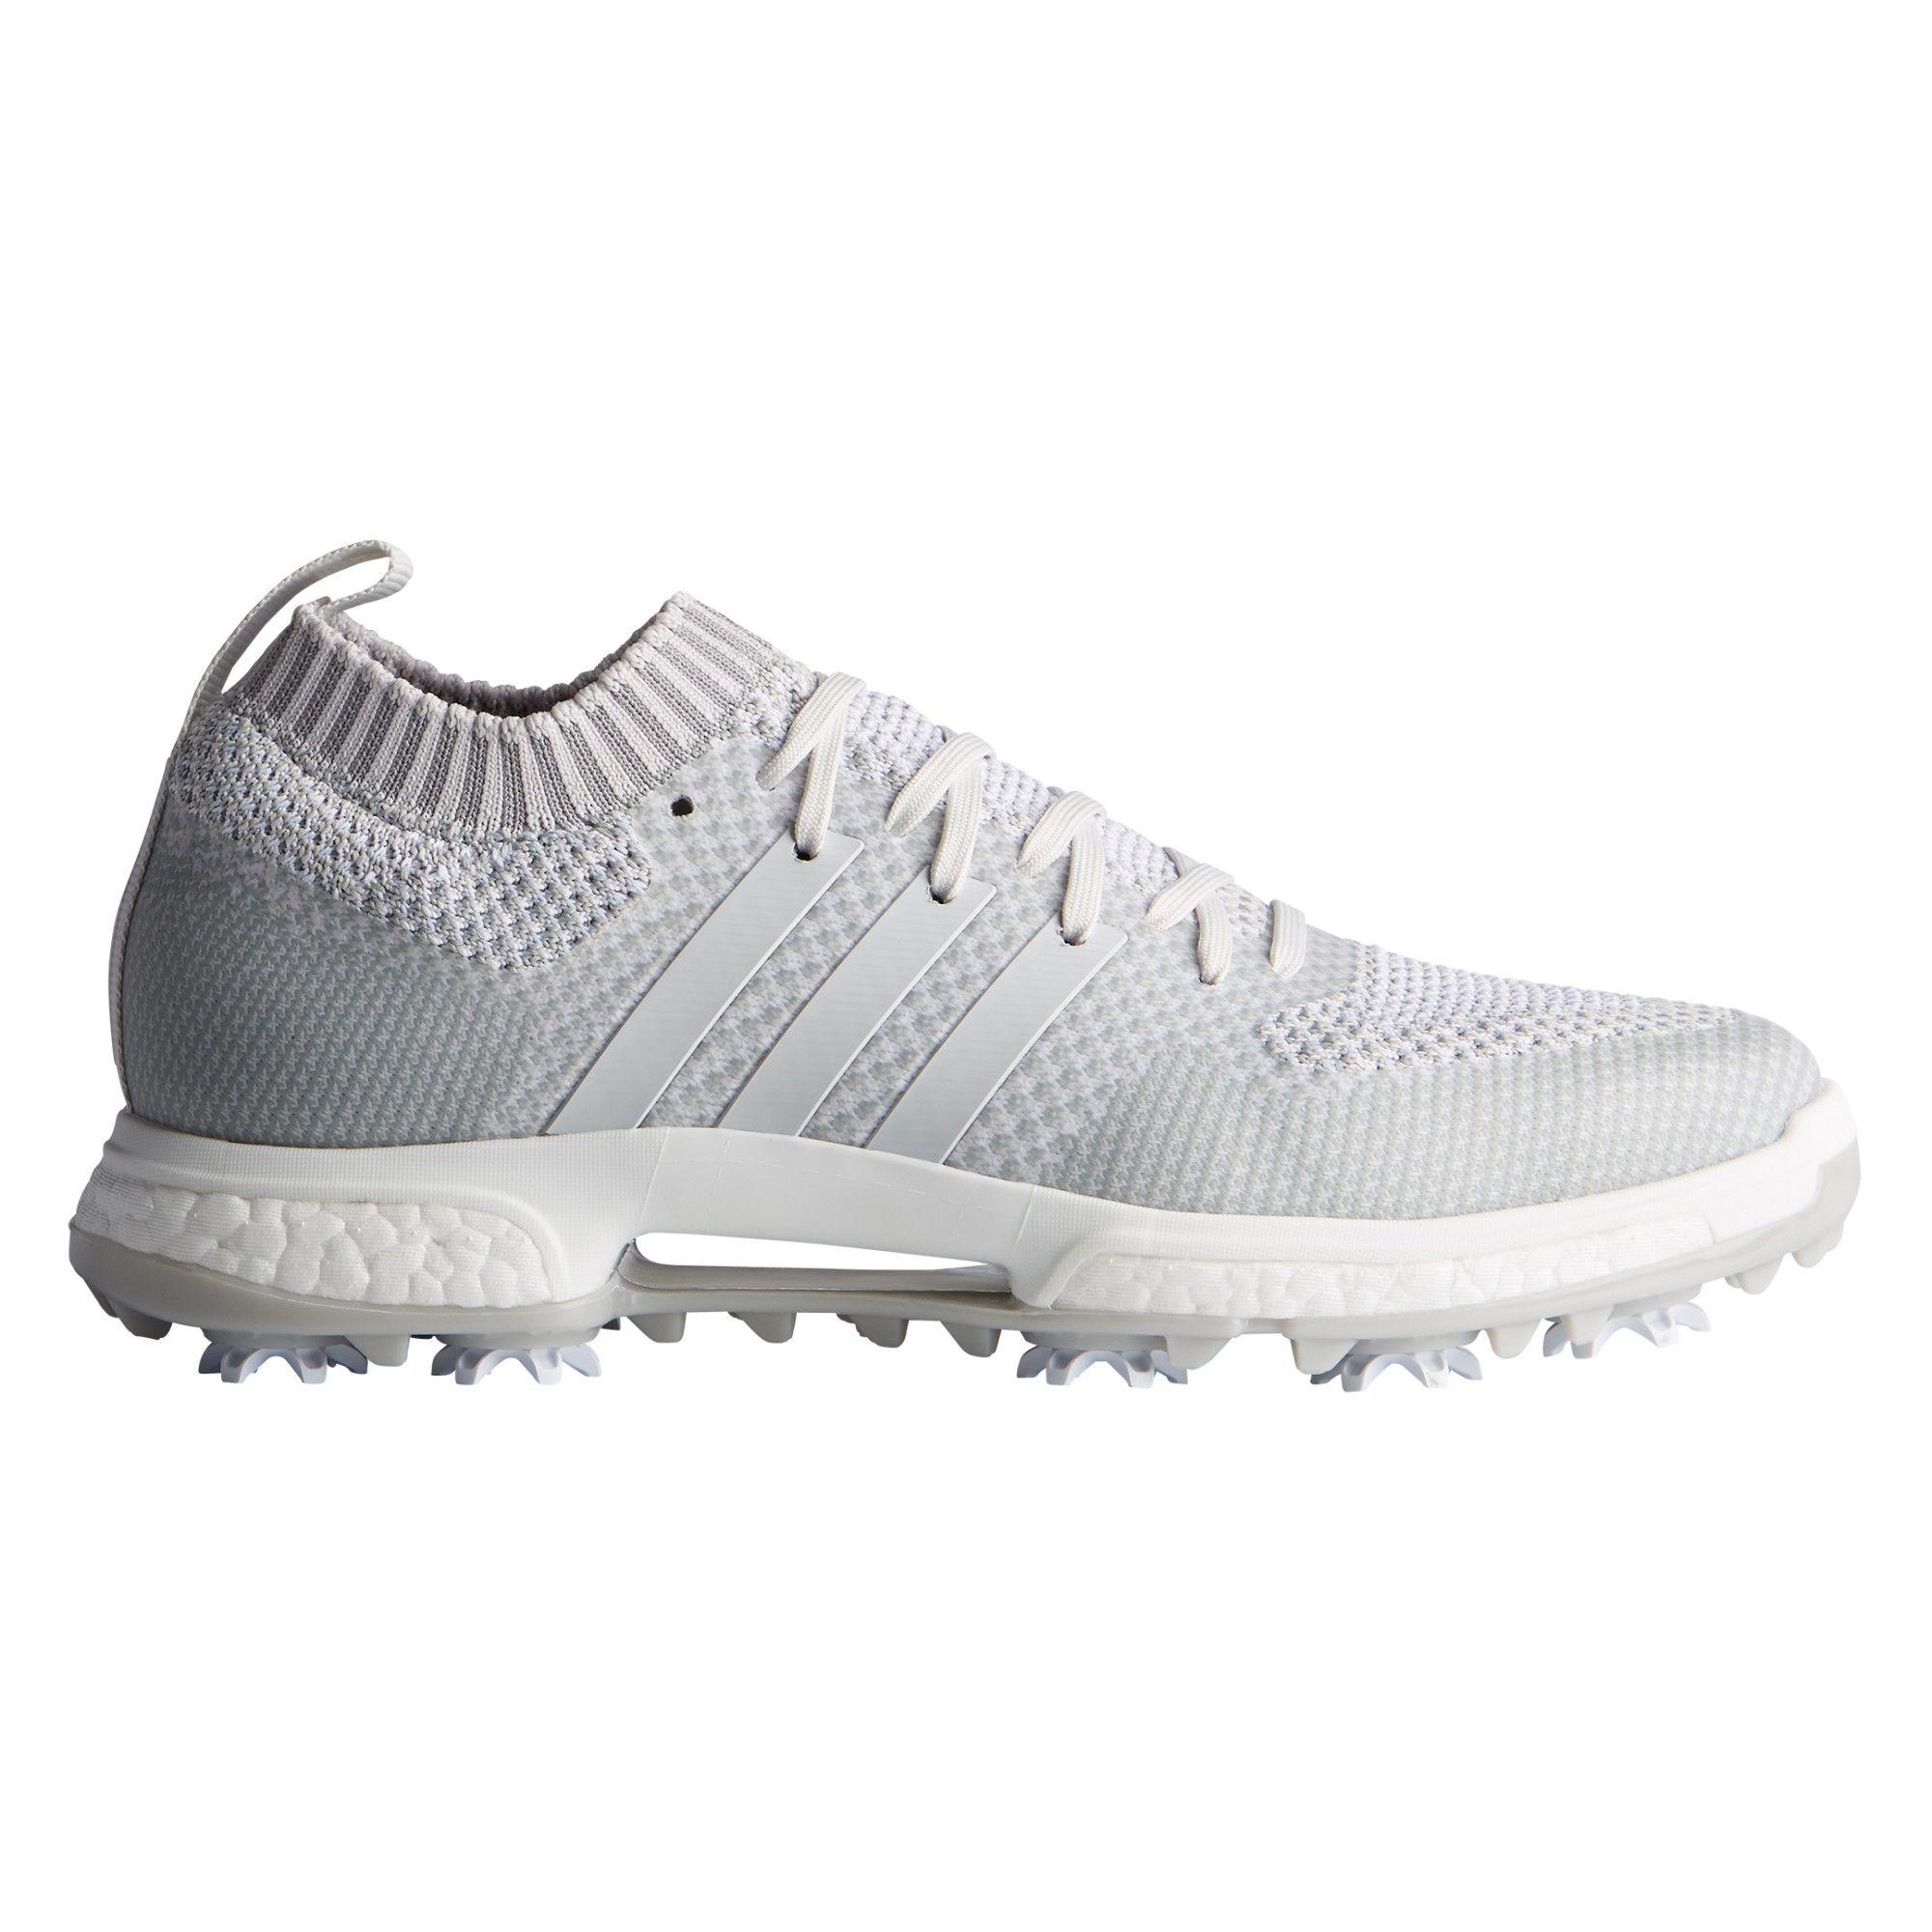 56e750e422e adidas Tour360 Boost Knit Golf Shoes F33628 | shoes | Shoes, Adidas ...